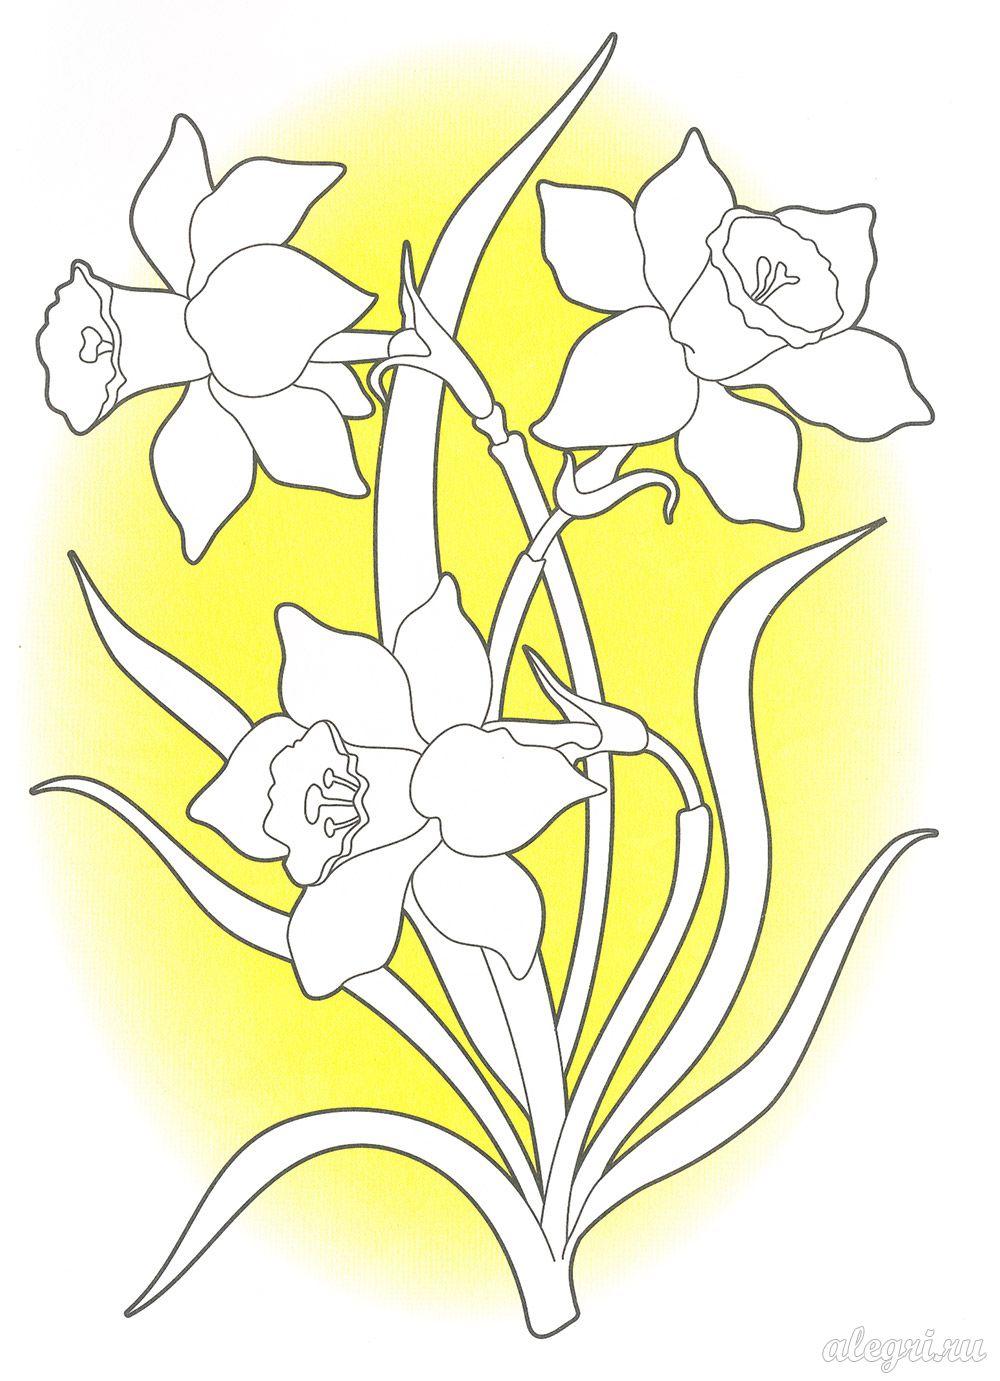 Раскраски для детей от 5 лет. Нарцисс